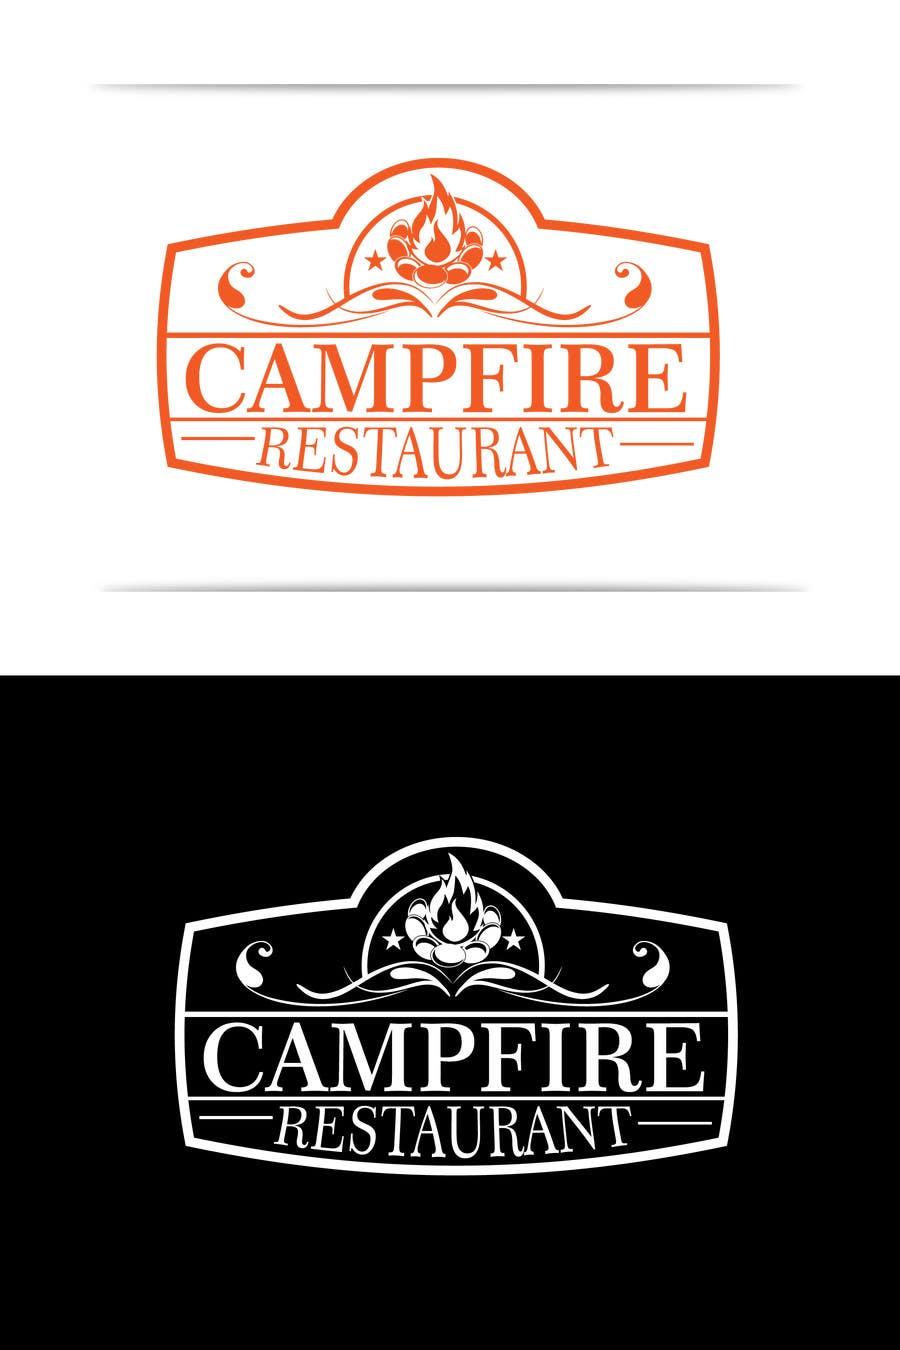 Penyertaan Peraduan #10 untuk Redesign a current restaurant logo